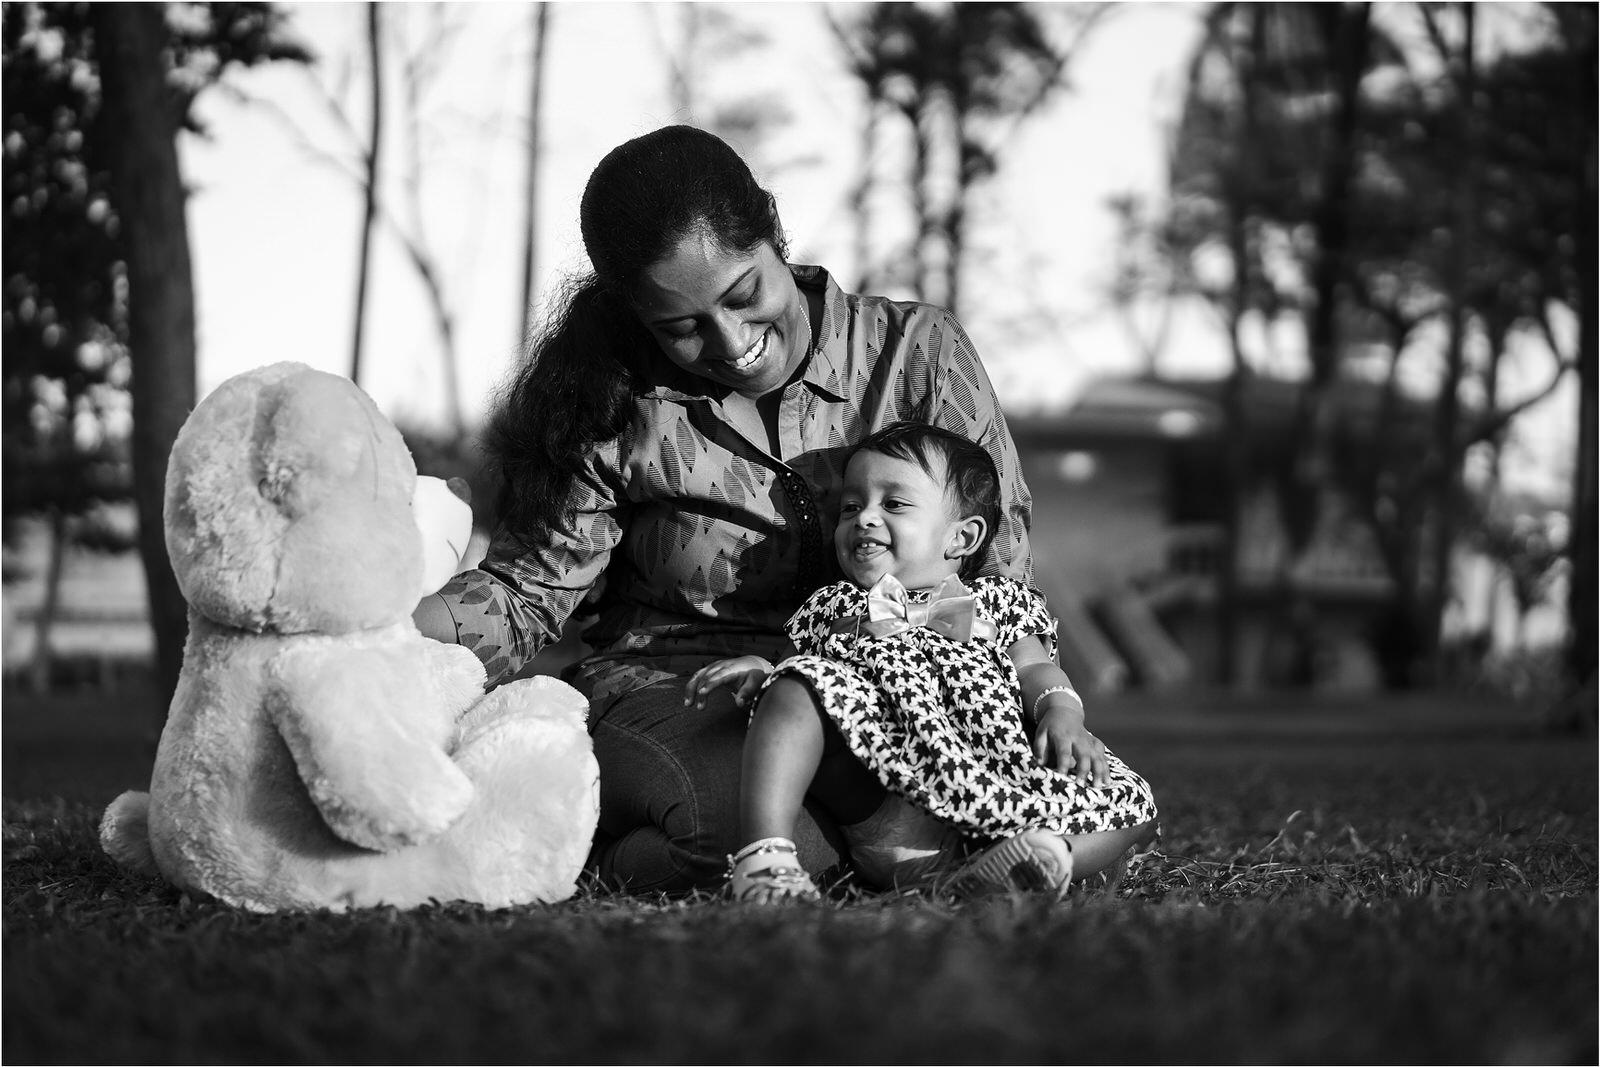 19012019-Nila-Pratyush-Family-Shoot-1186-2.jpg